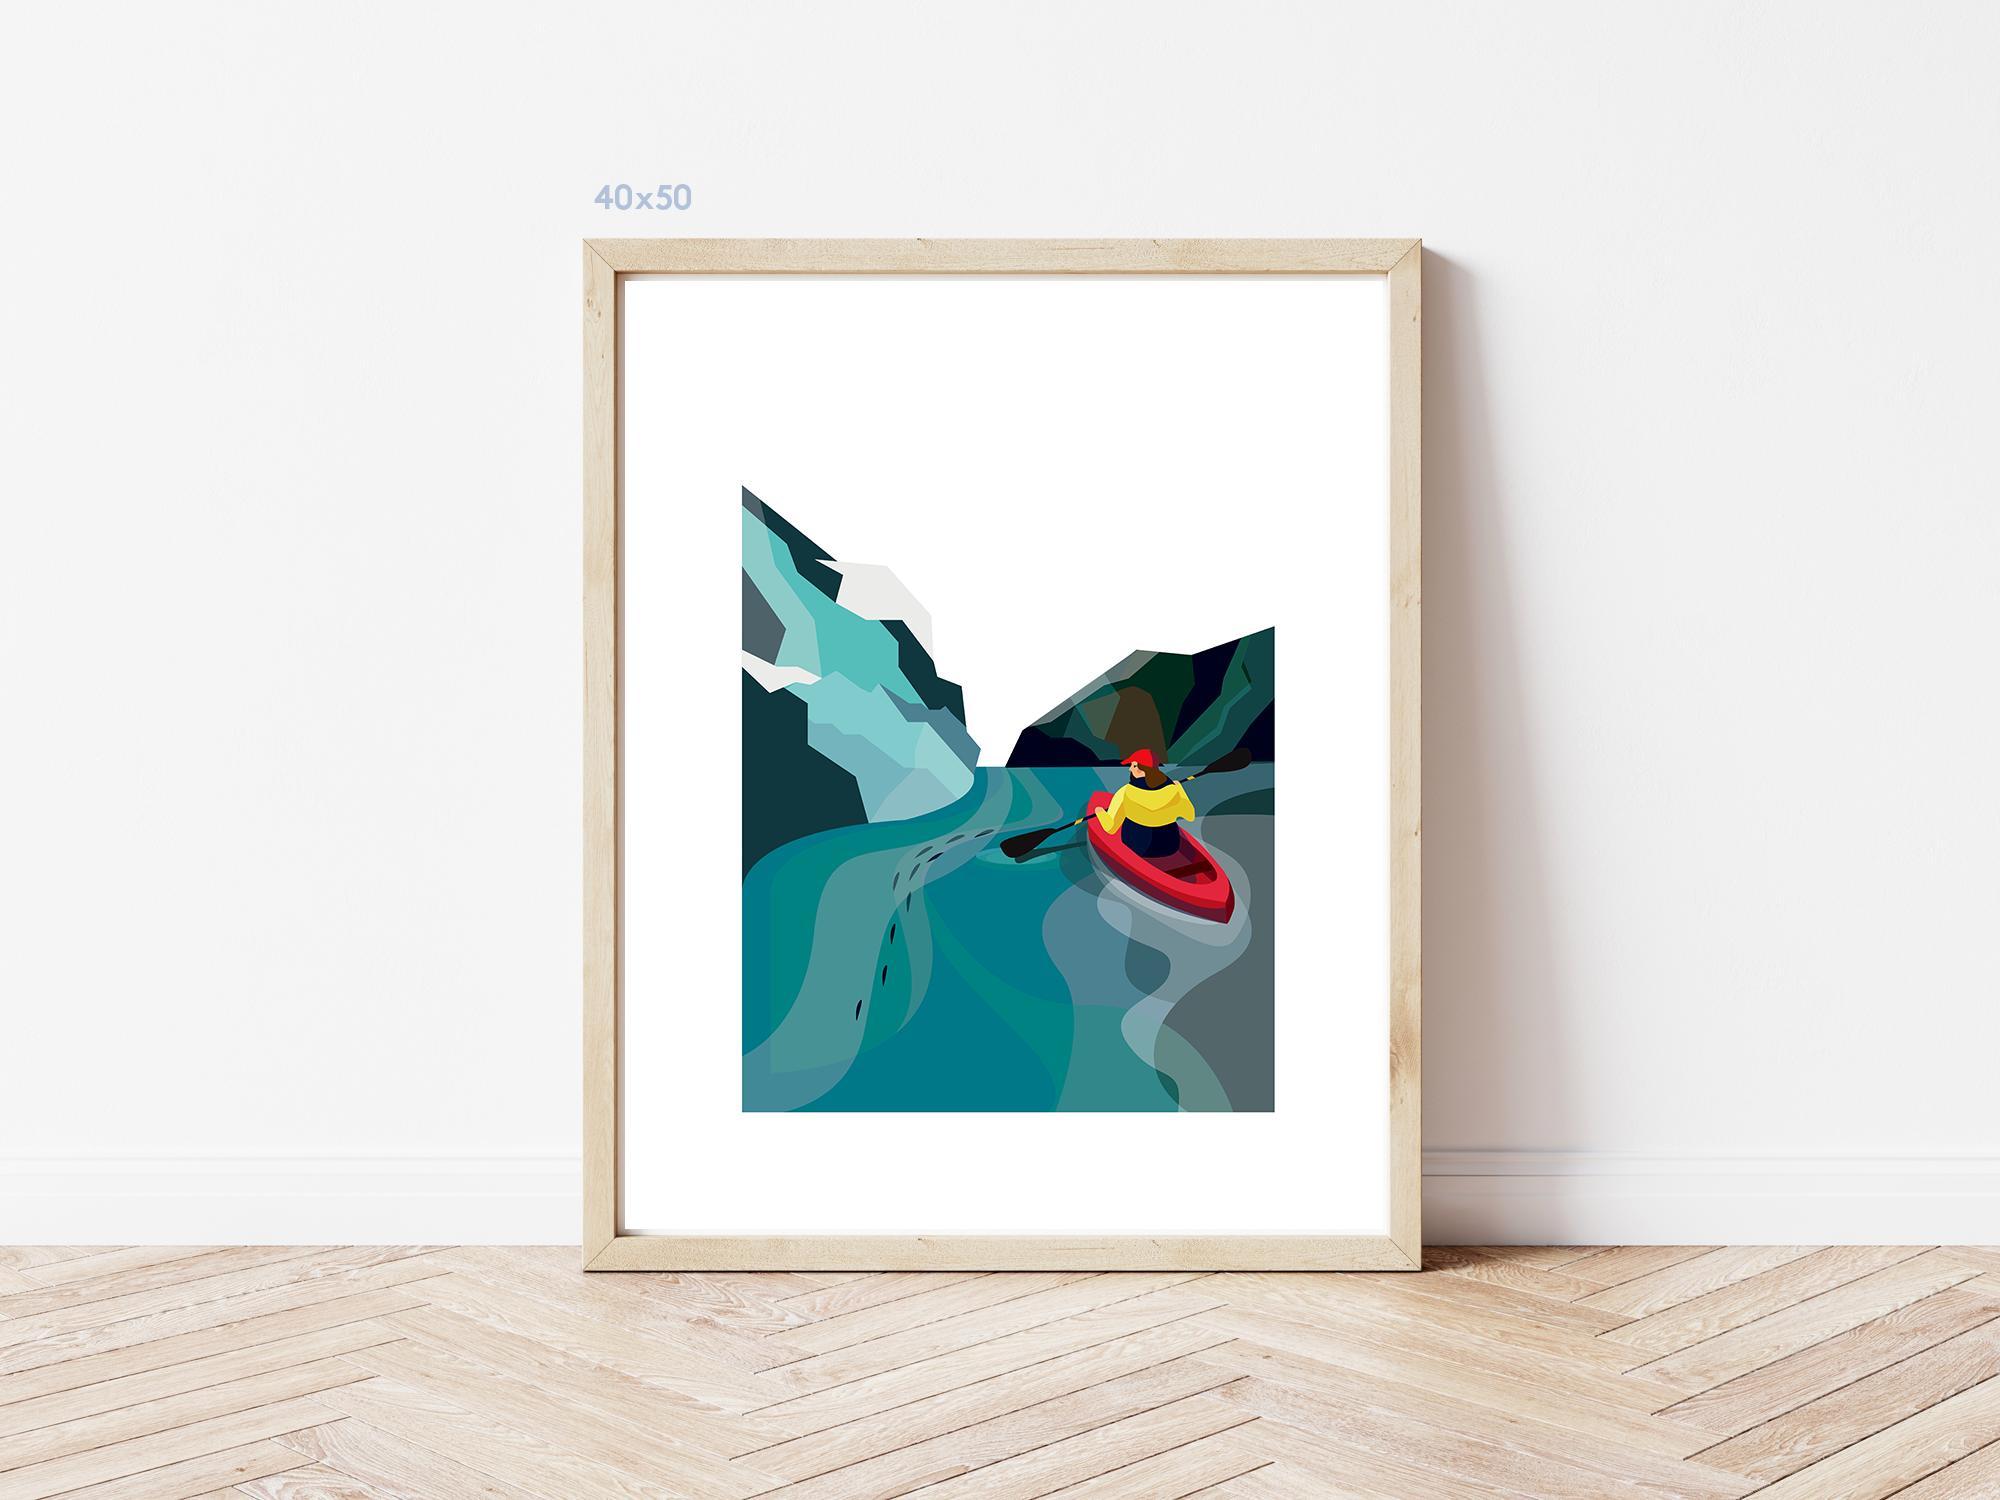 Kaśka - plakat Kajakarz - KABAK